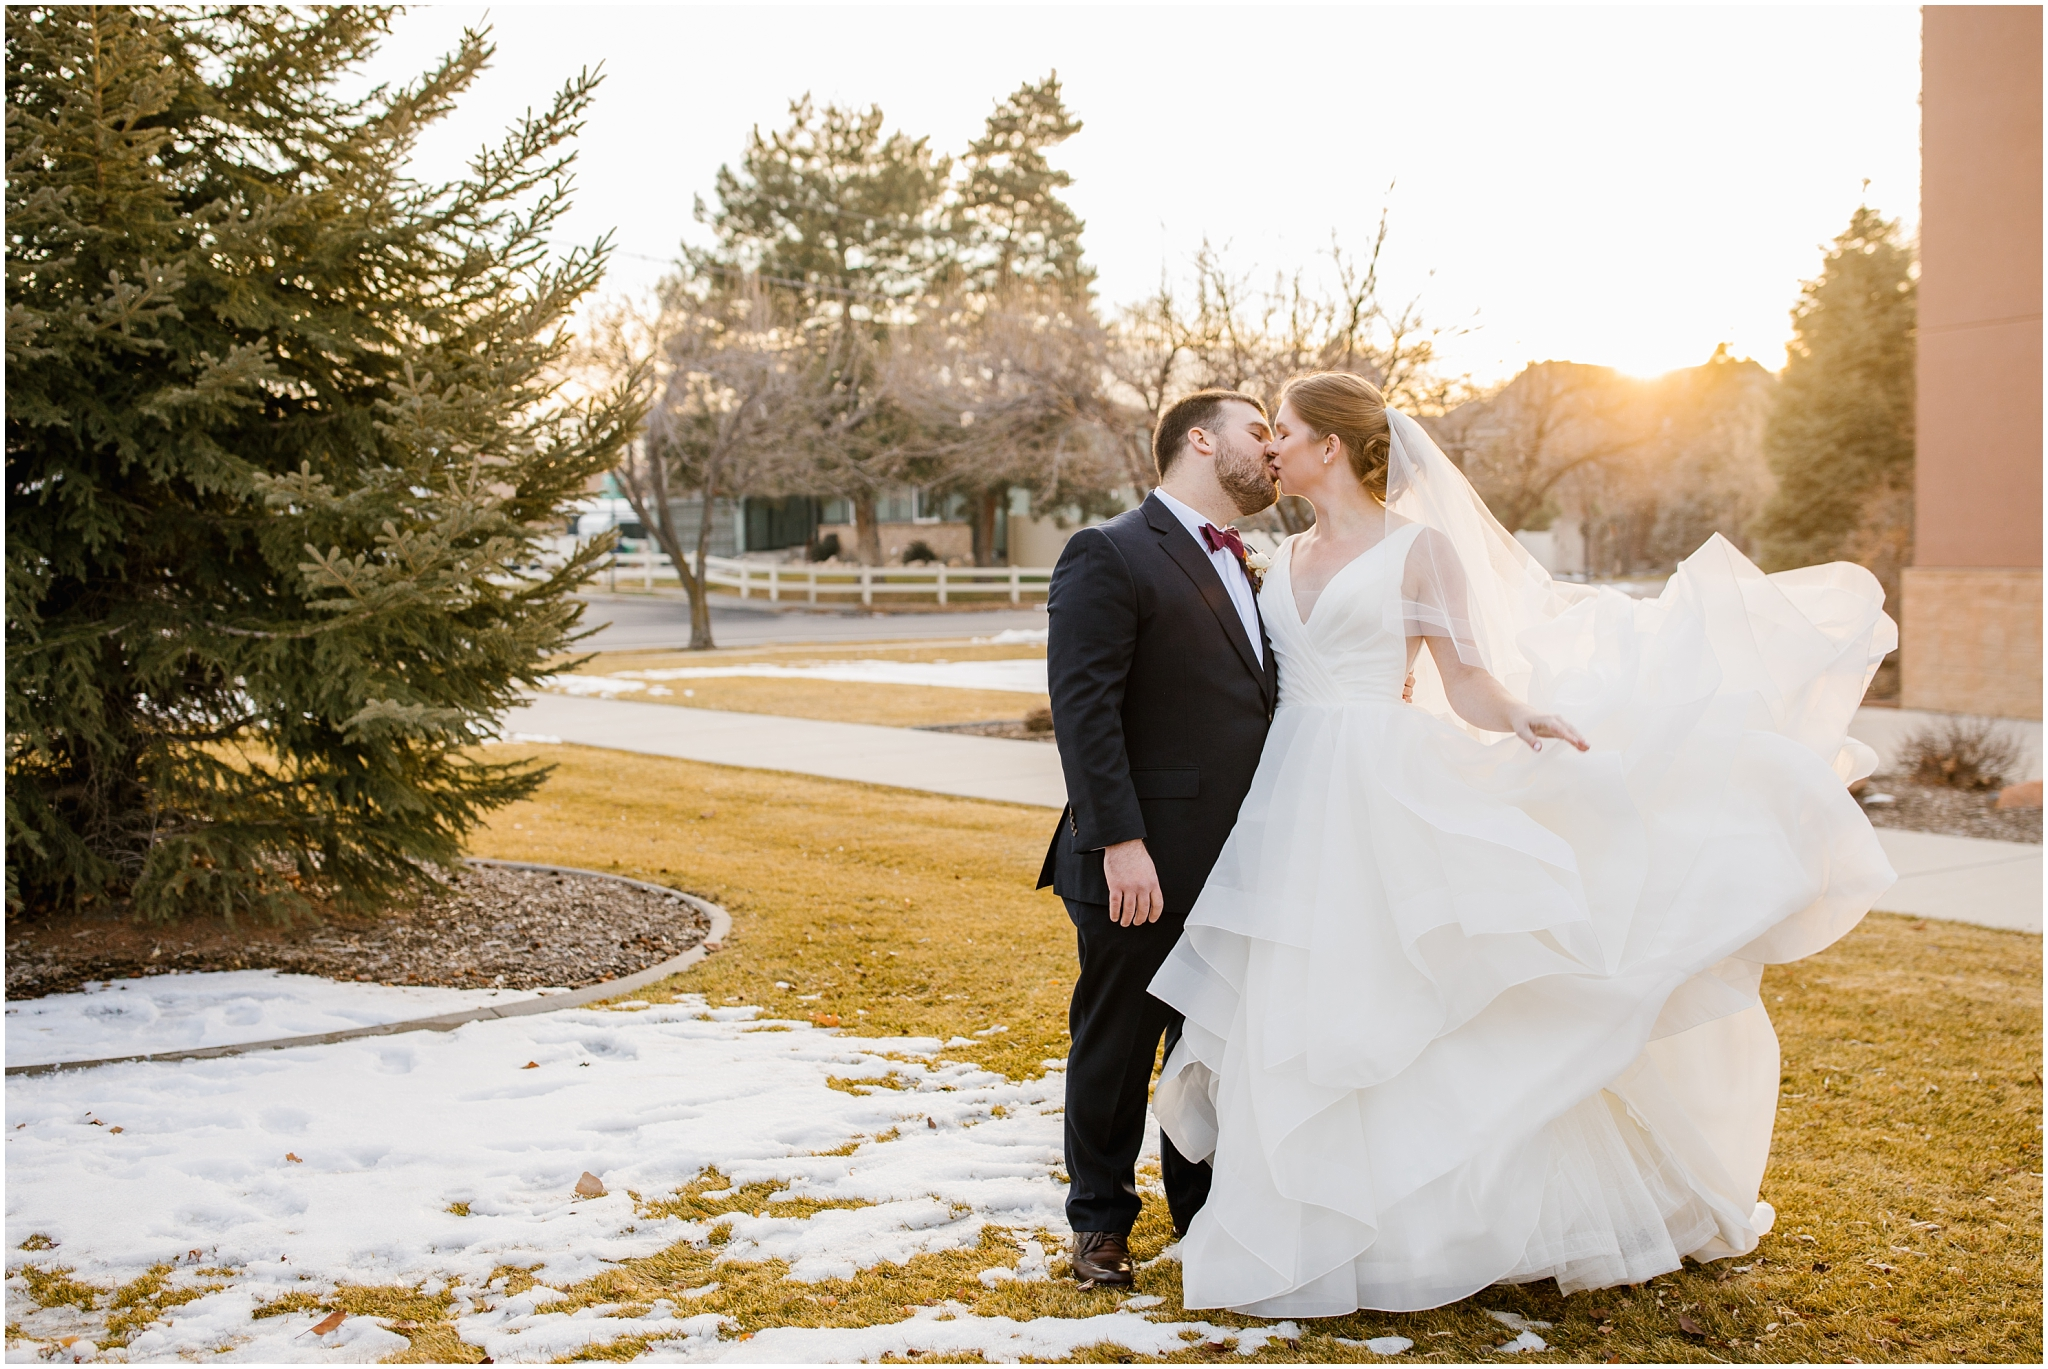 CN-Wedding-272_Lizzie-B-Imagery-Utah-Wedding-Photographer-Blessed-Sacrament-Catholic-Church-Sandy-Utah-The-Blended-Table-Salt-Lake-City.jpg